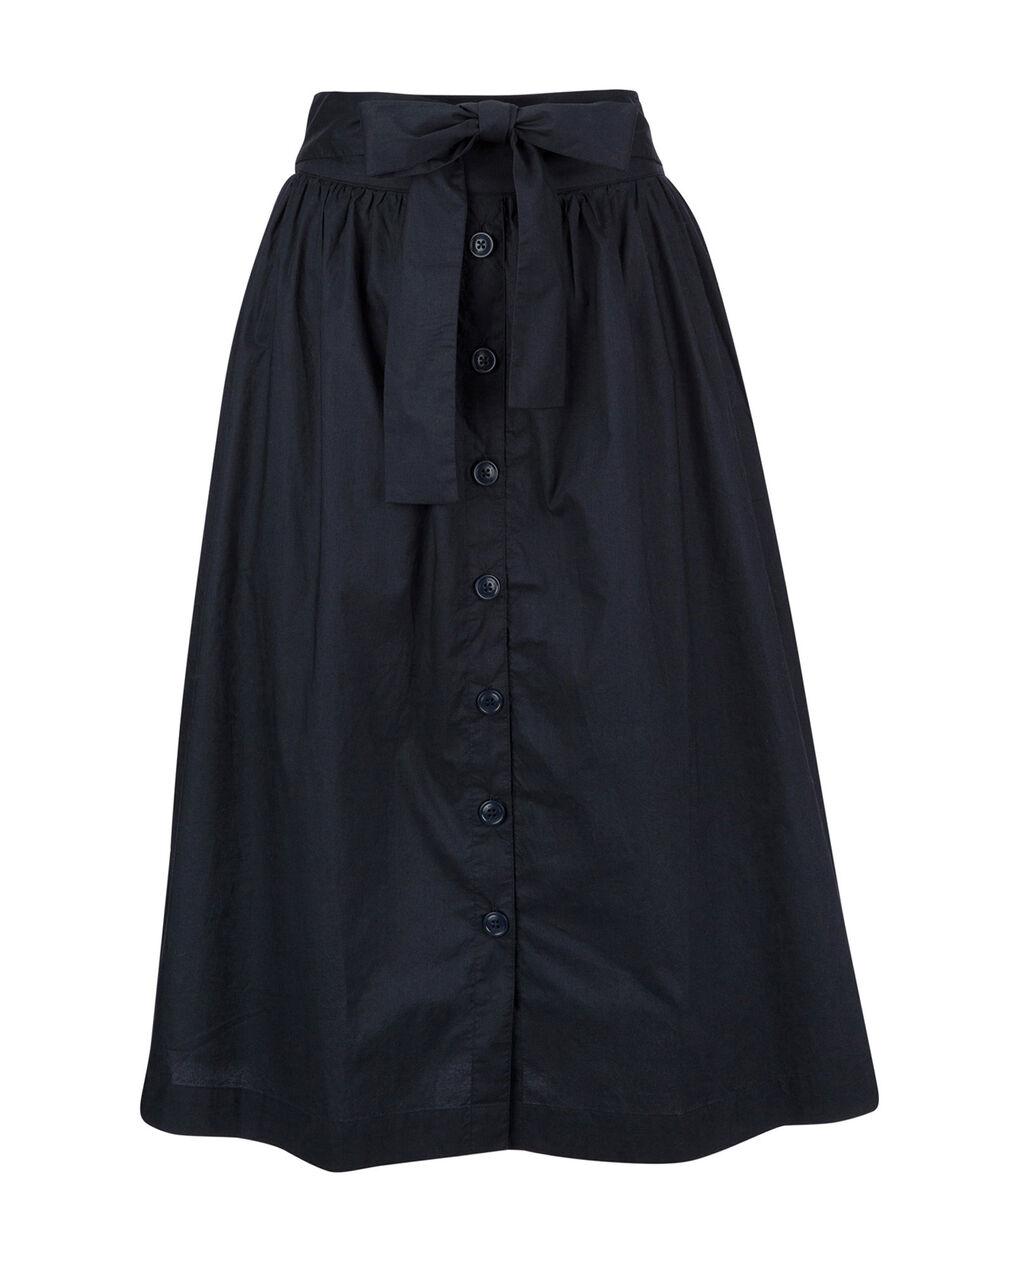 W'S Popeline  Button Skirt, NIGHT SKY, hi-res